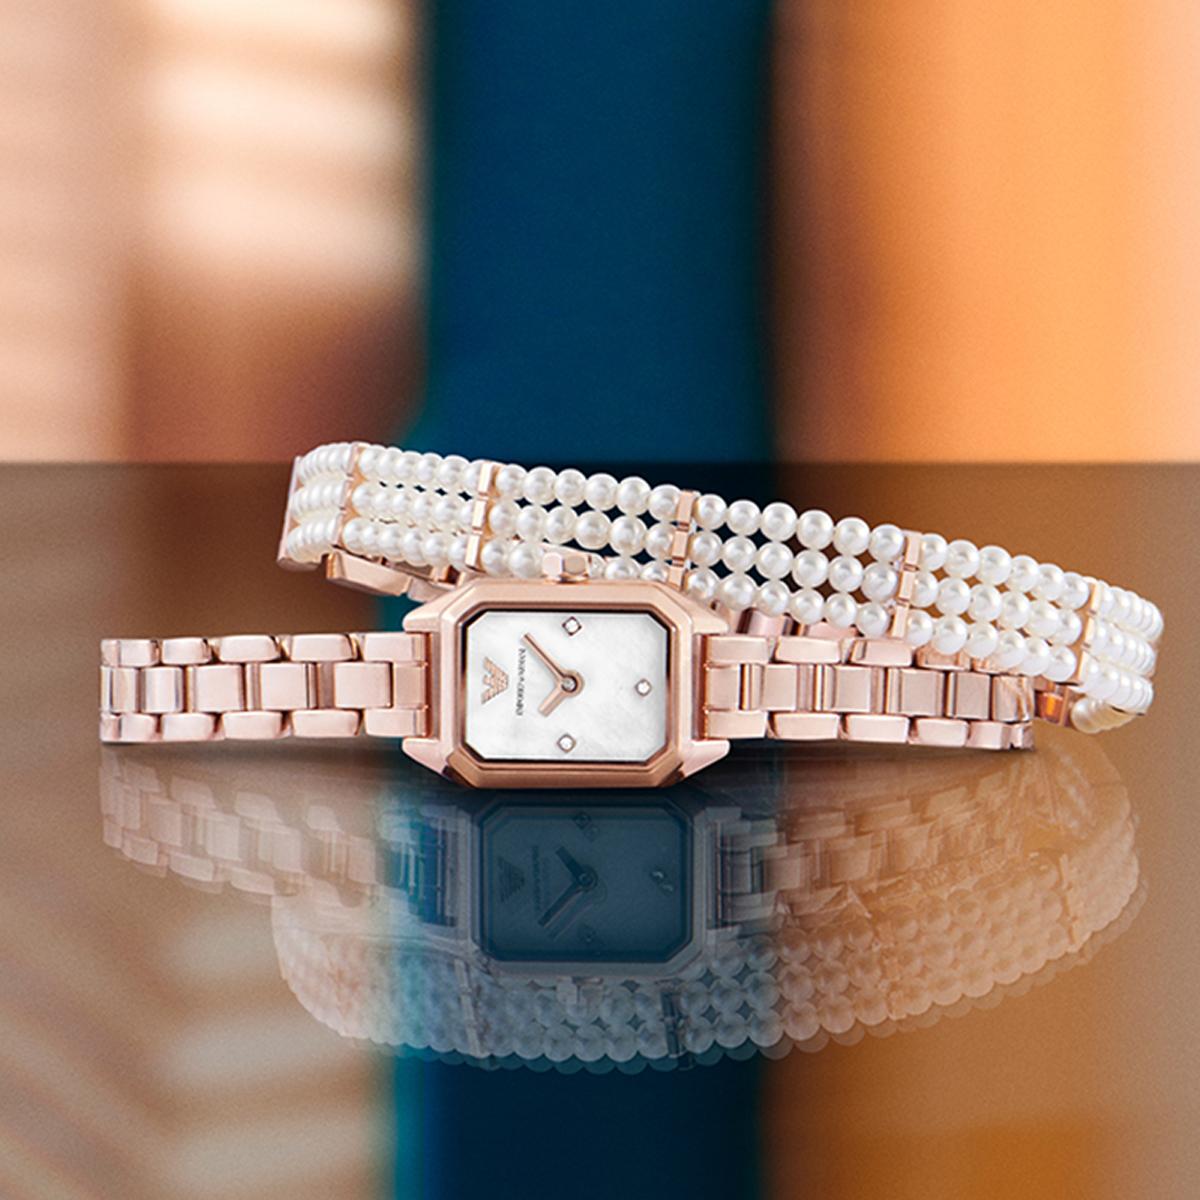 Armani阿玛尼礼盒套装玫瑰金小方表 小巧精致珍珠方形女表AR11323